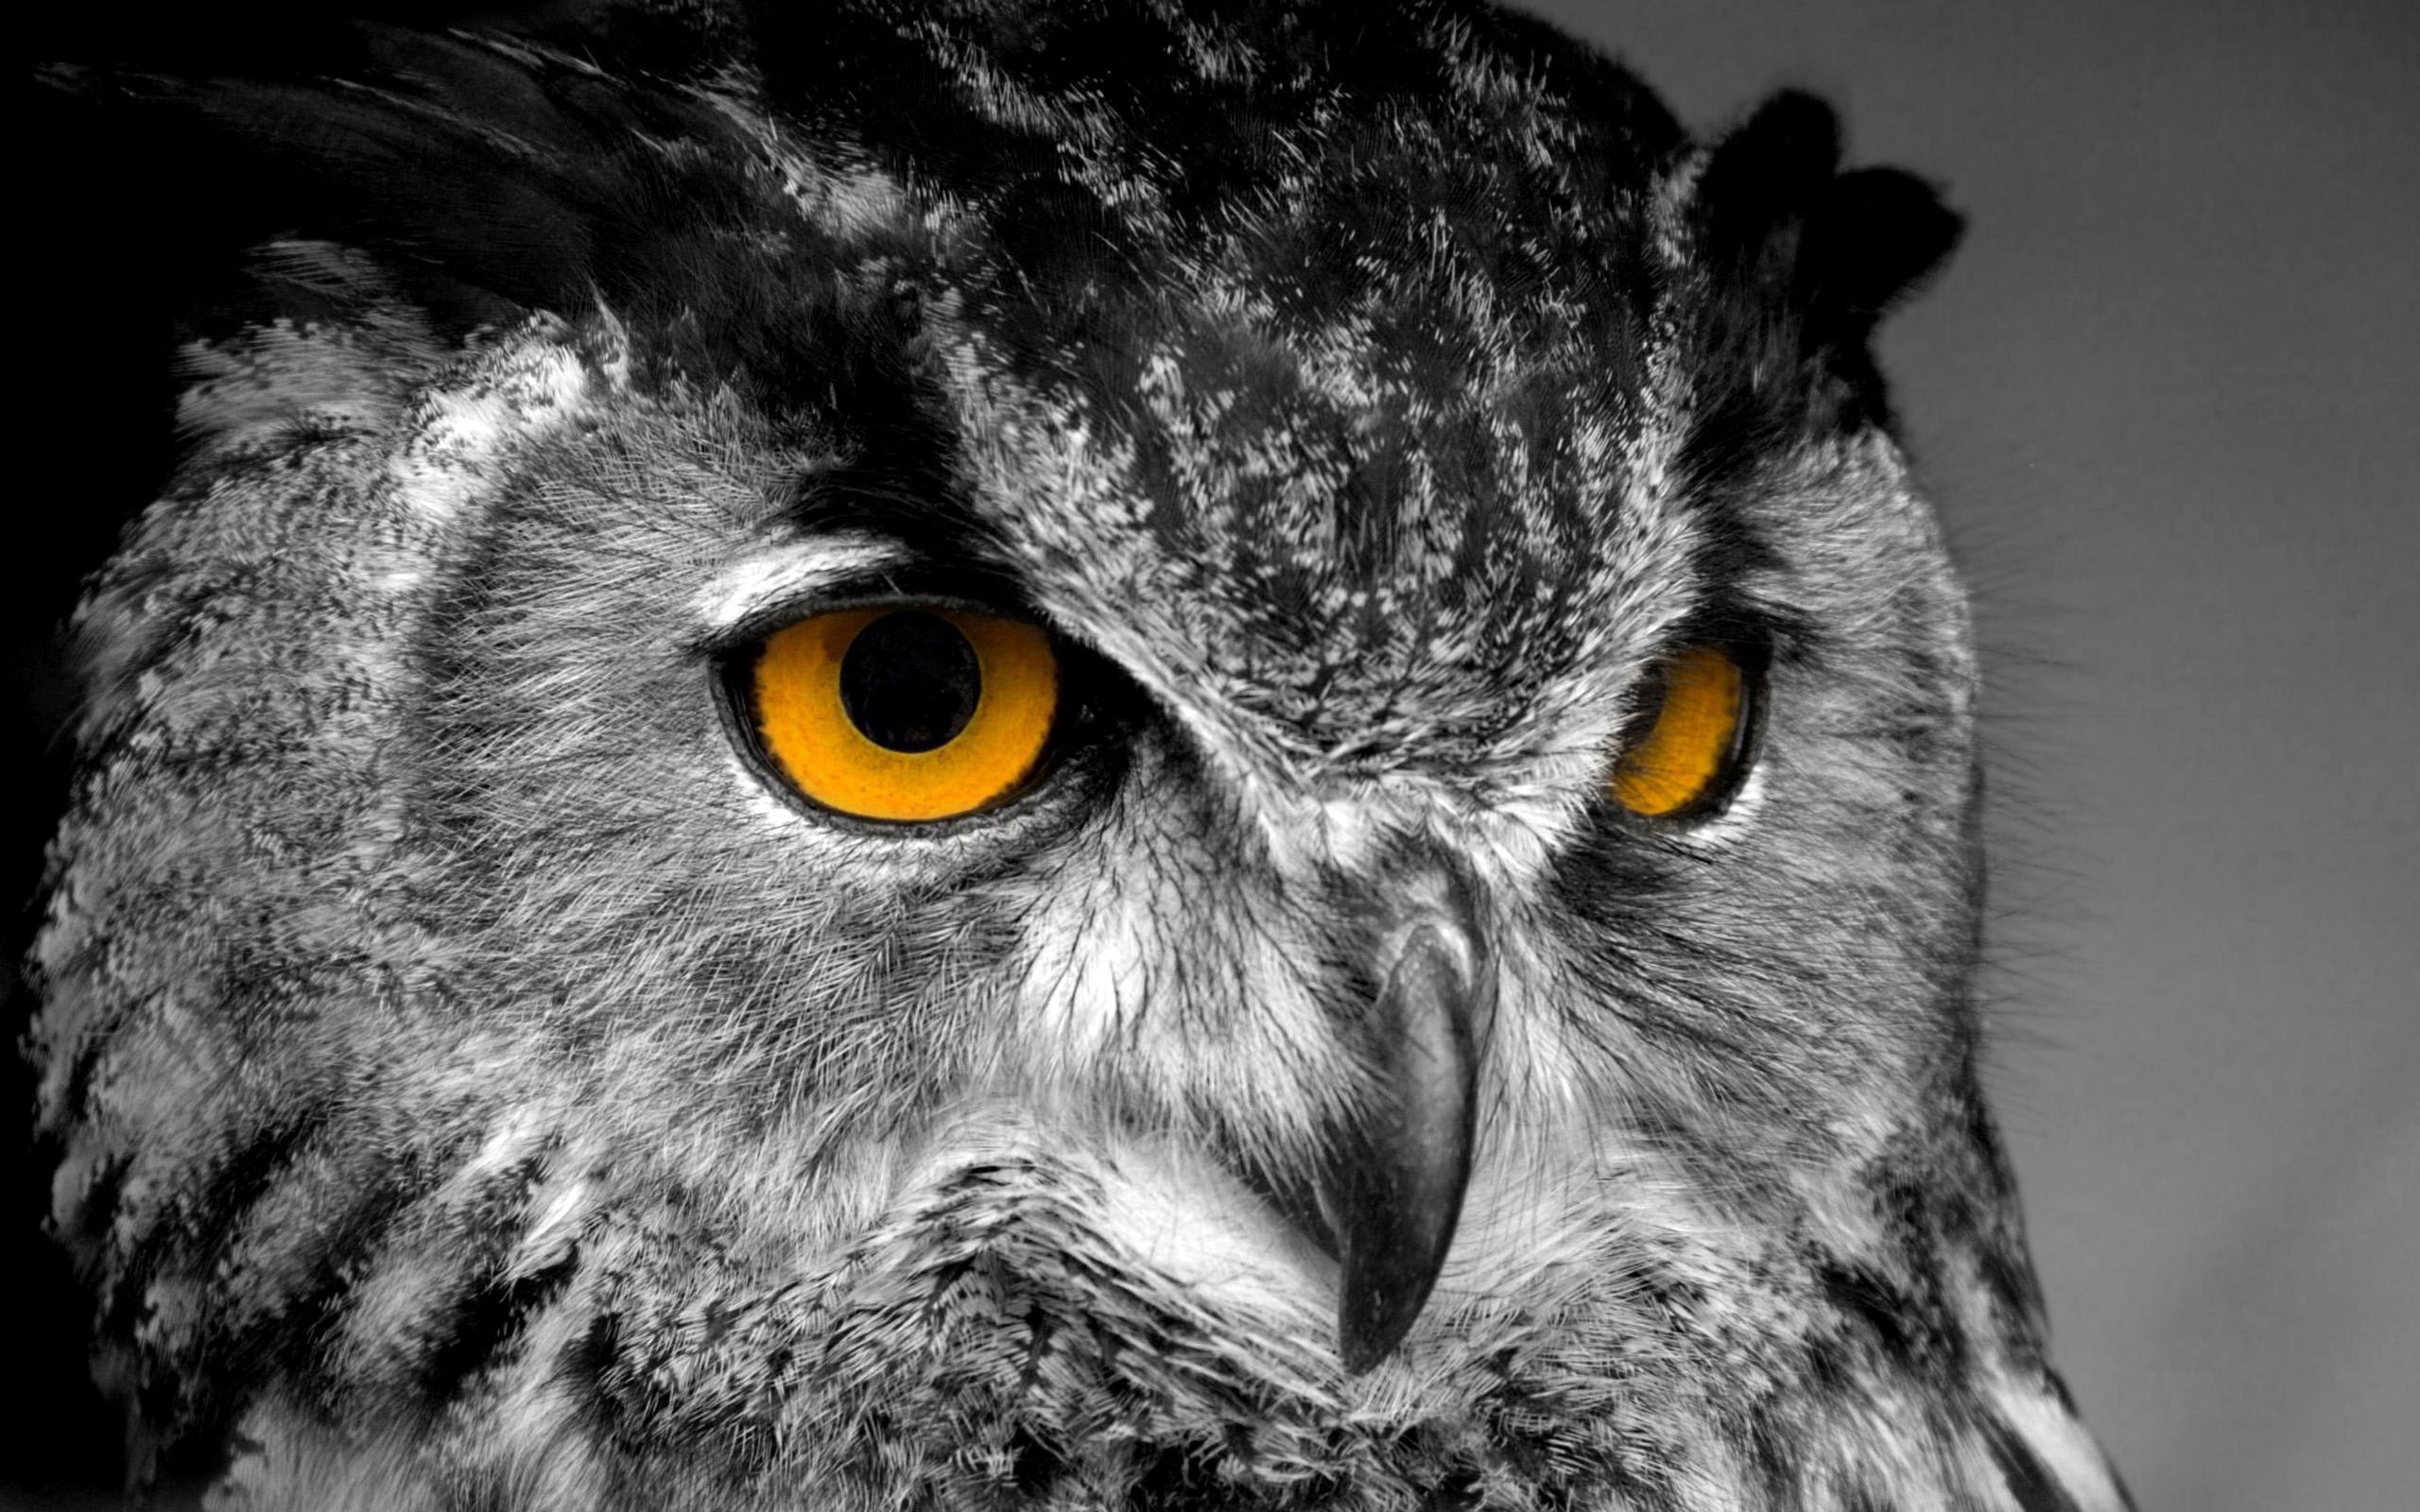 Wallpaper Owl The Wallpaper